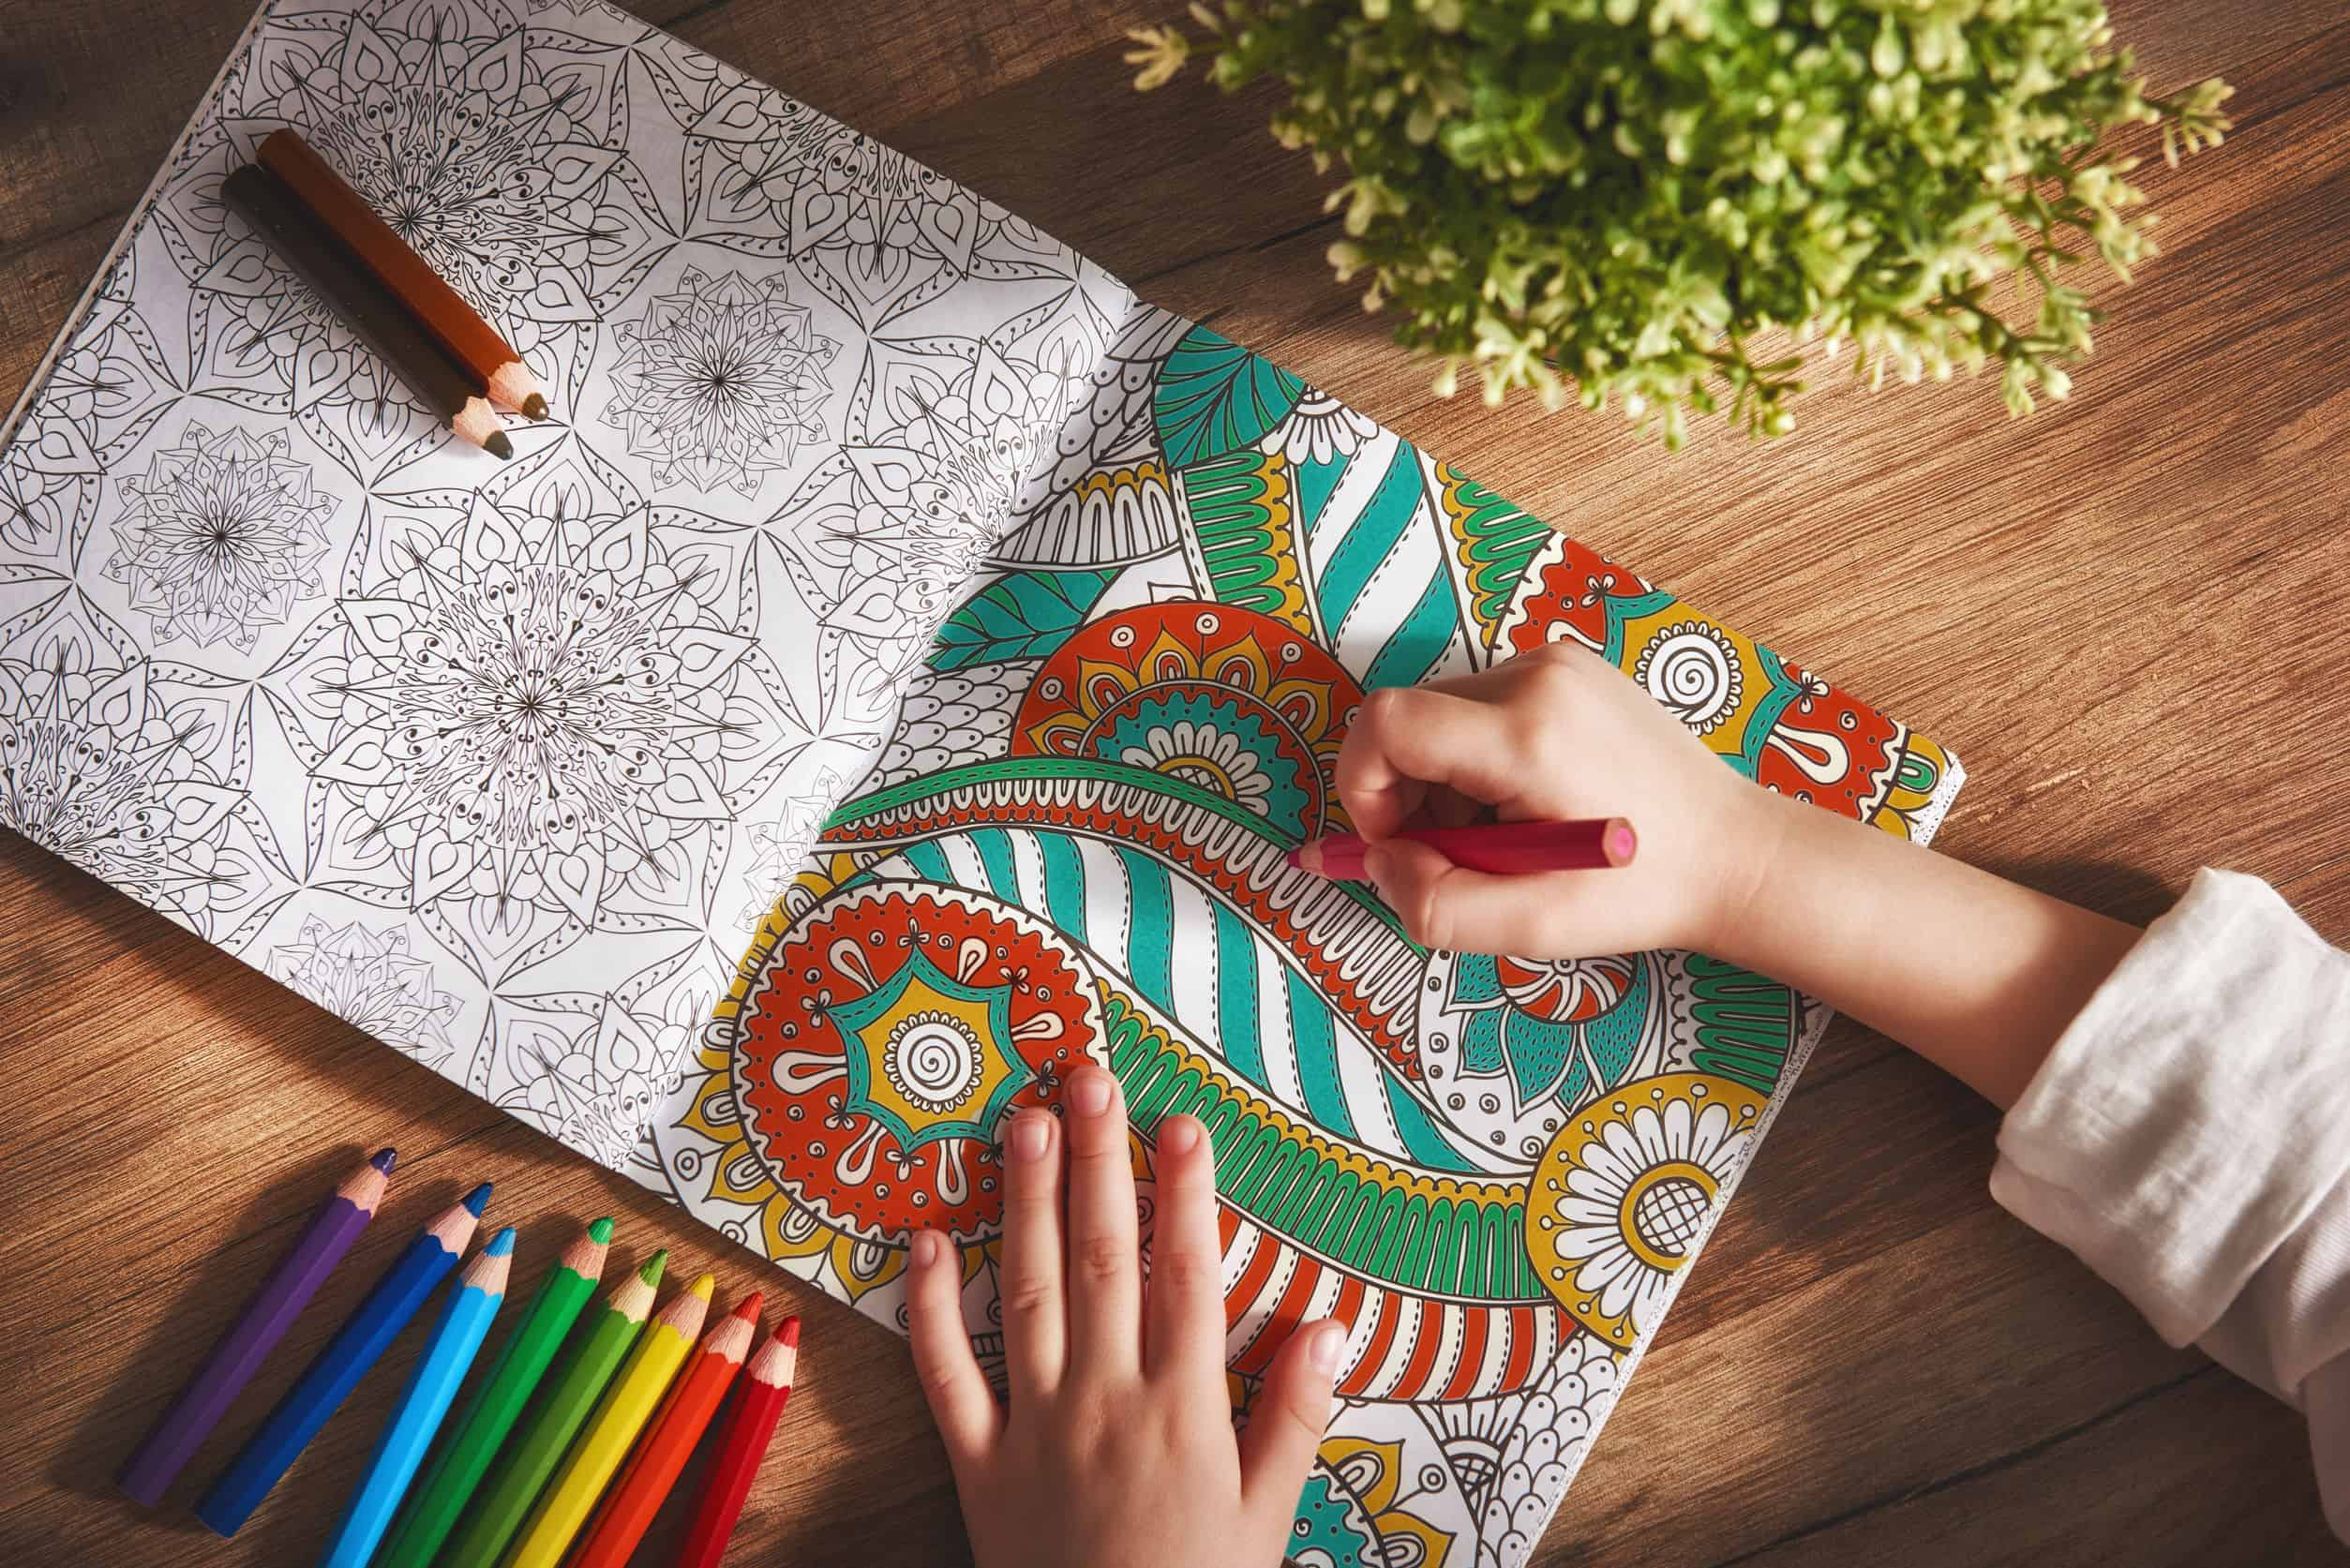 Bambino che colora un libro